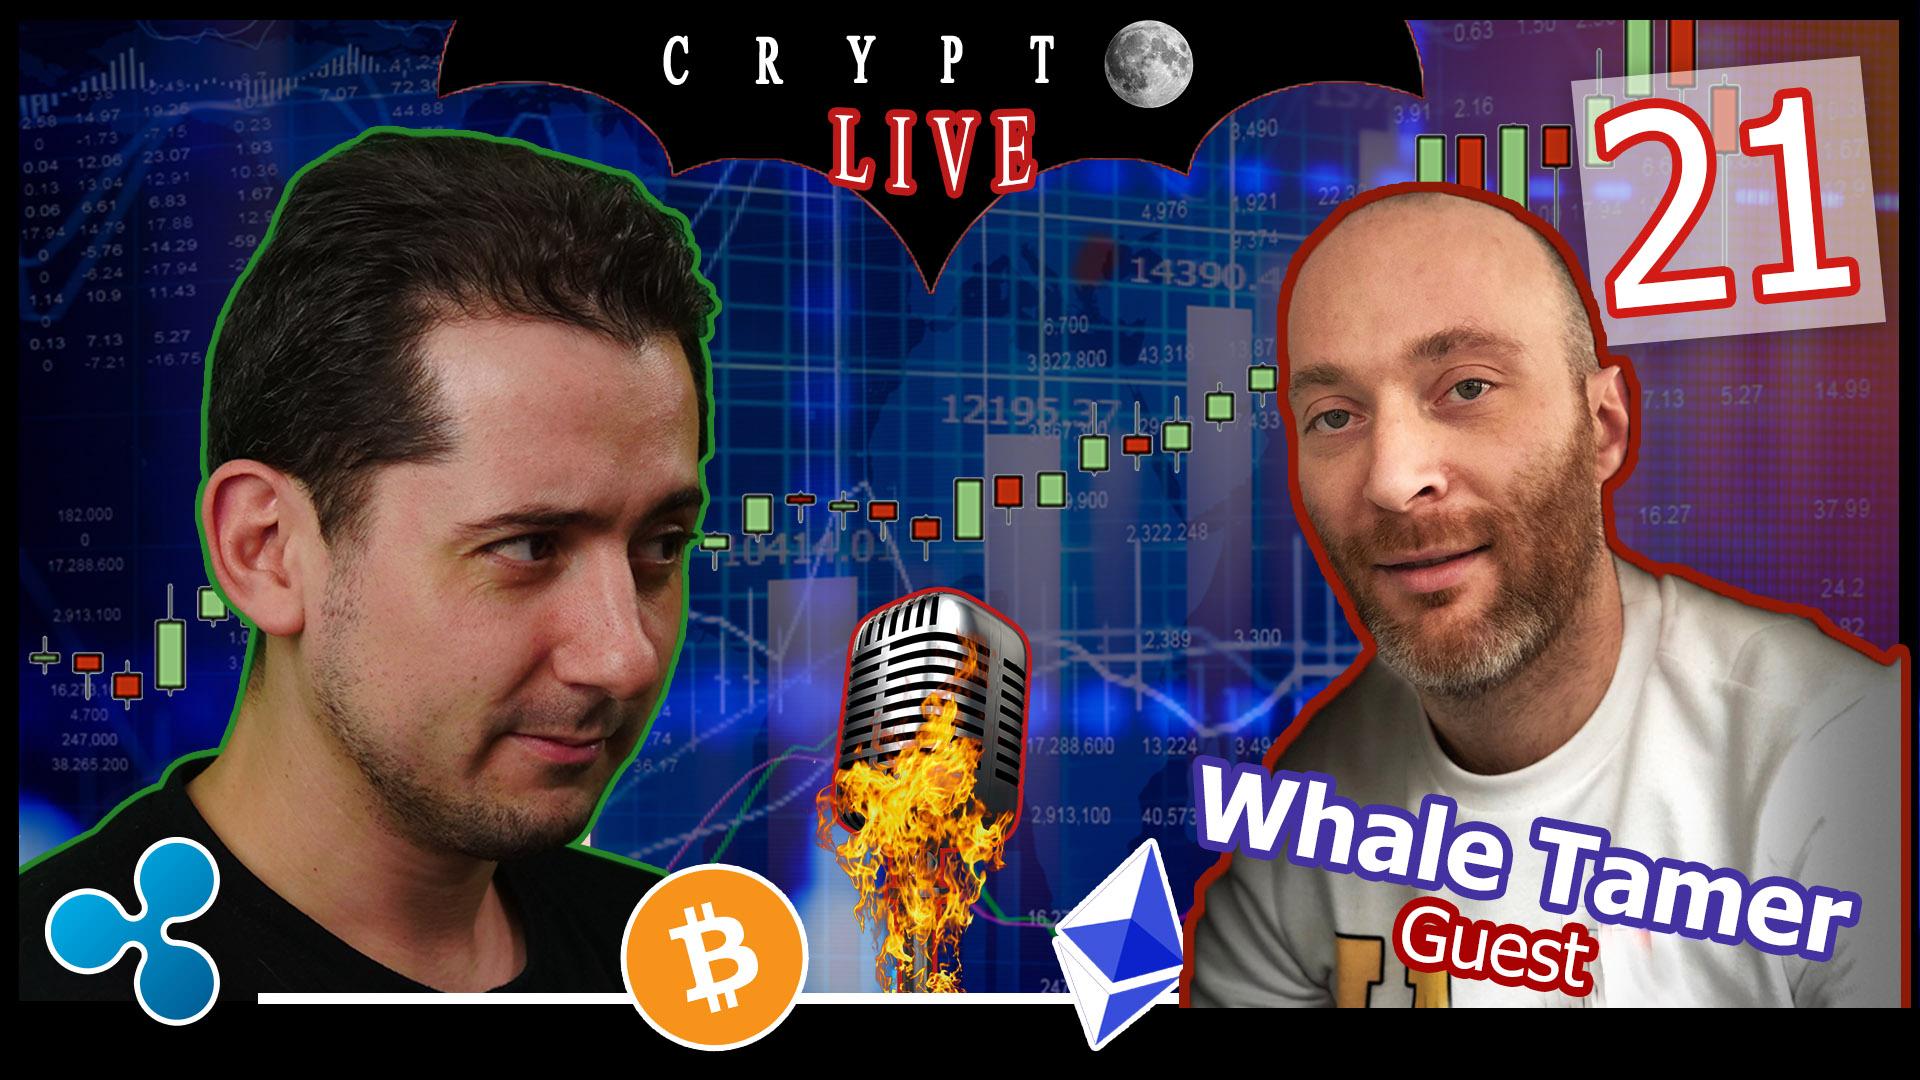 Bitcoin #CryptoLive 21 avec Whale Tamer 👕 #Regulation #Coinbase 🤔#CloudAct #ERC20